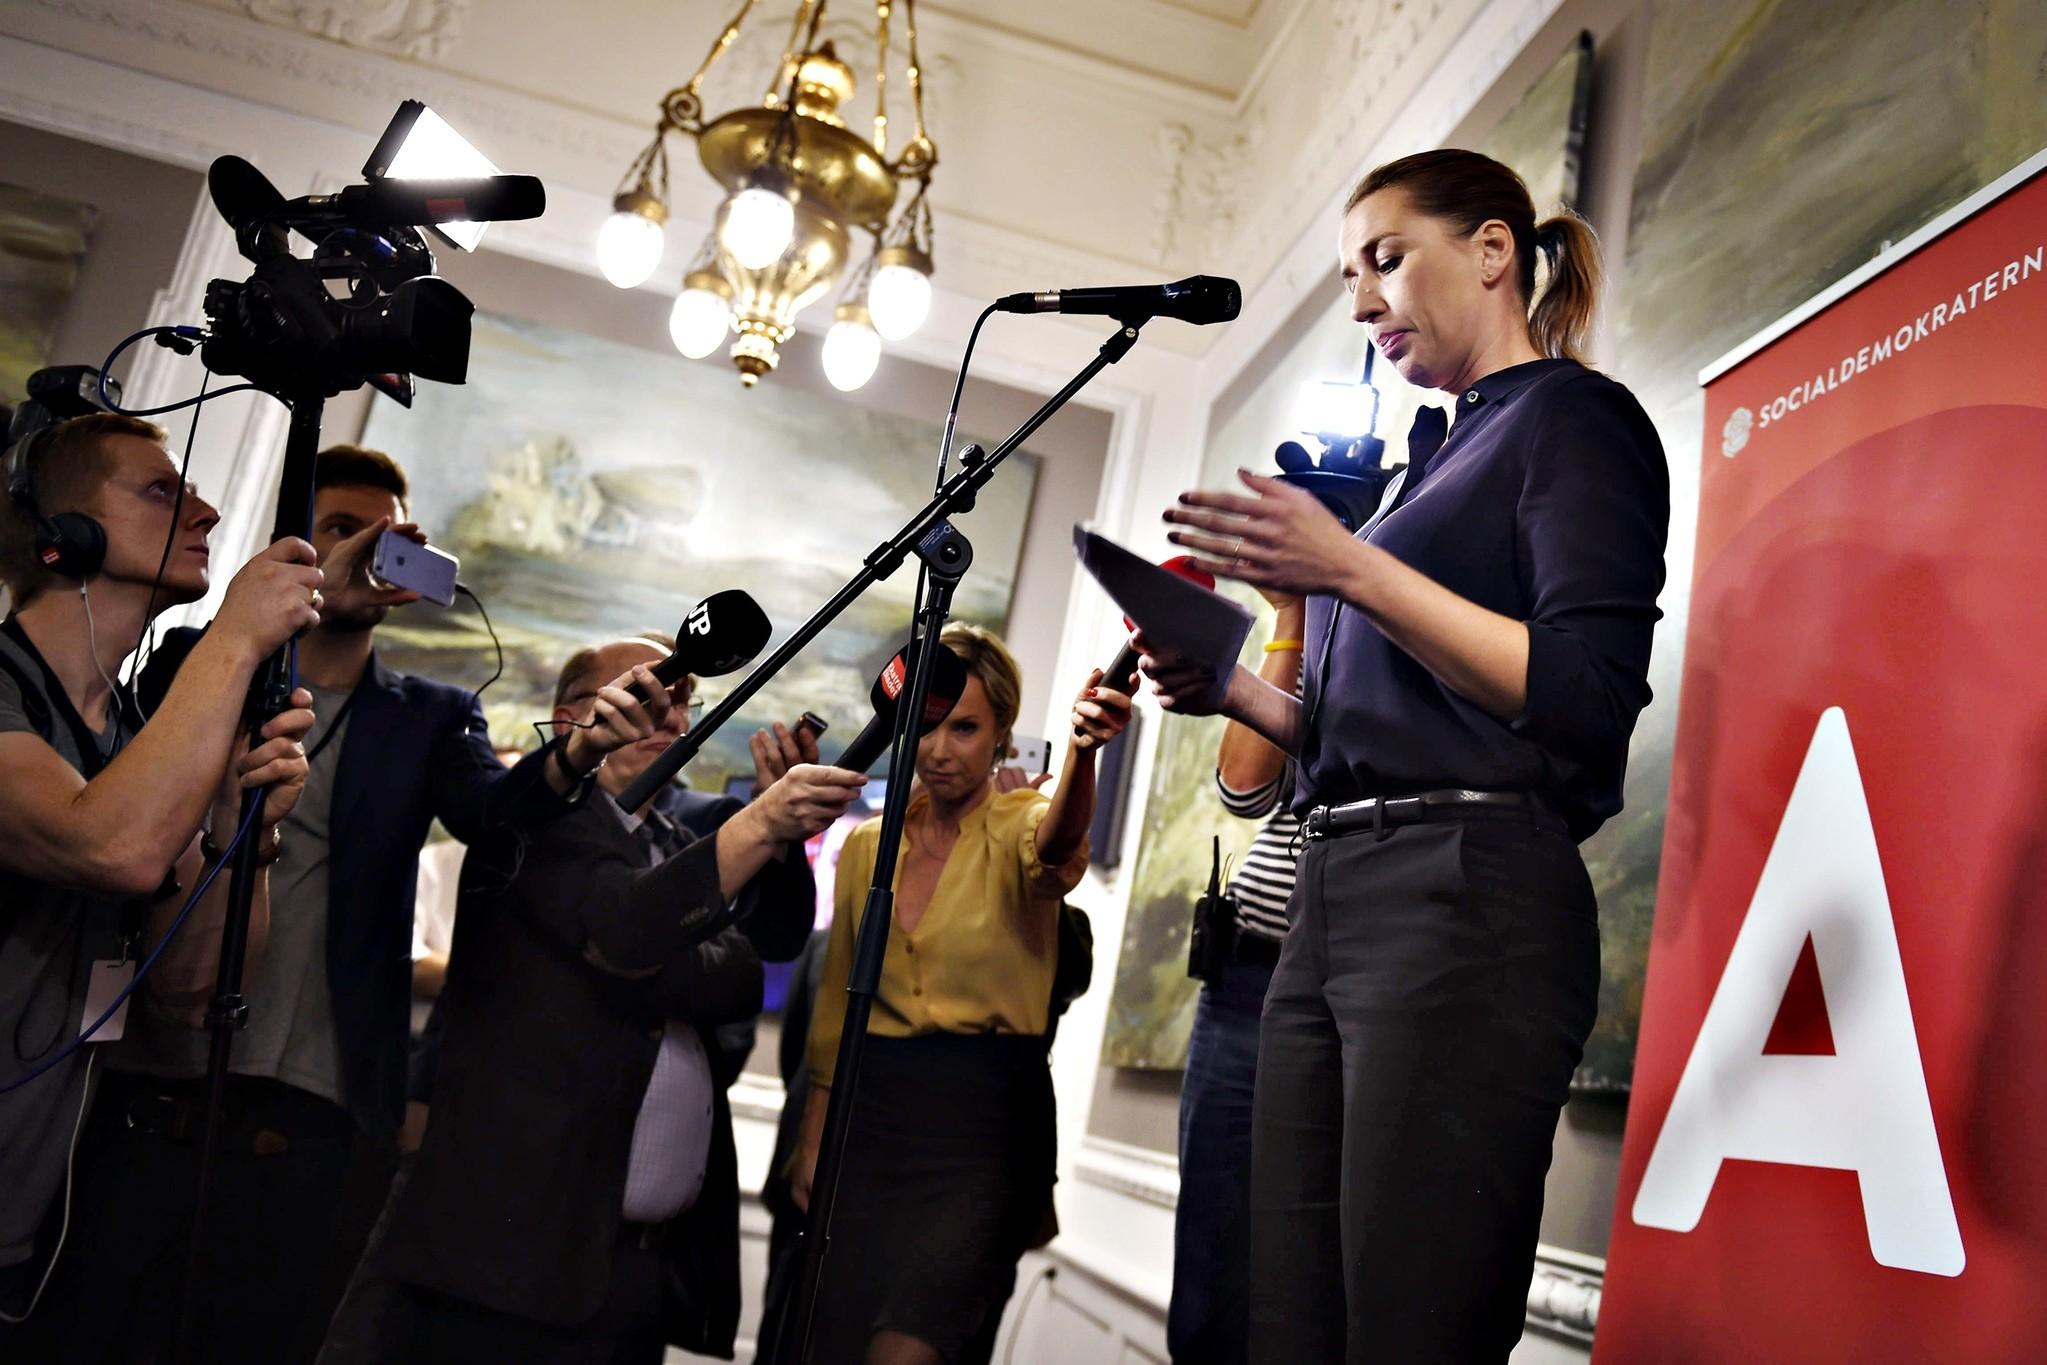 Mette Frederiksen speaks to the press in Copenhagen, December 3, 2015. (AFP Photo)